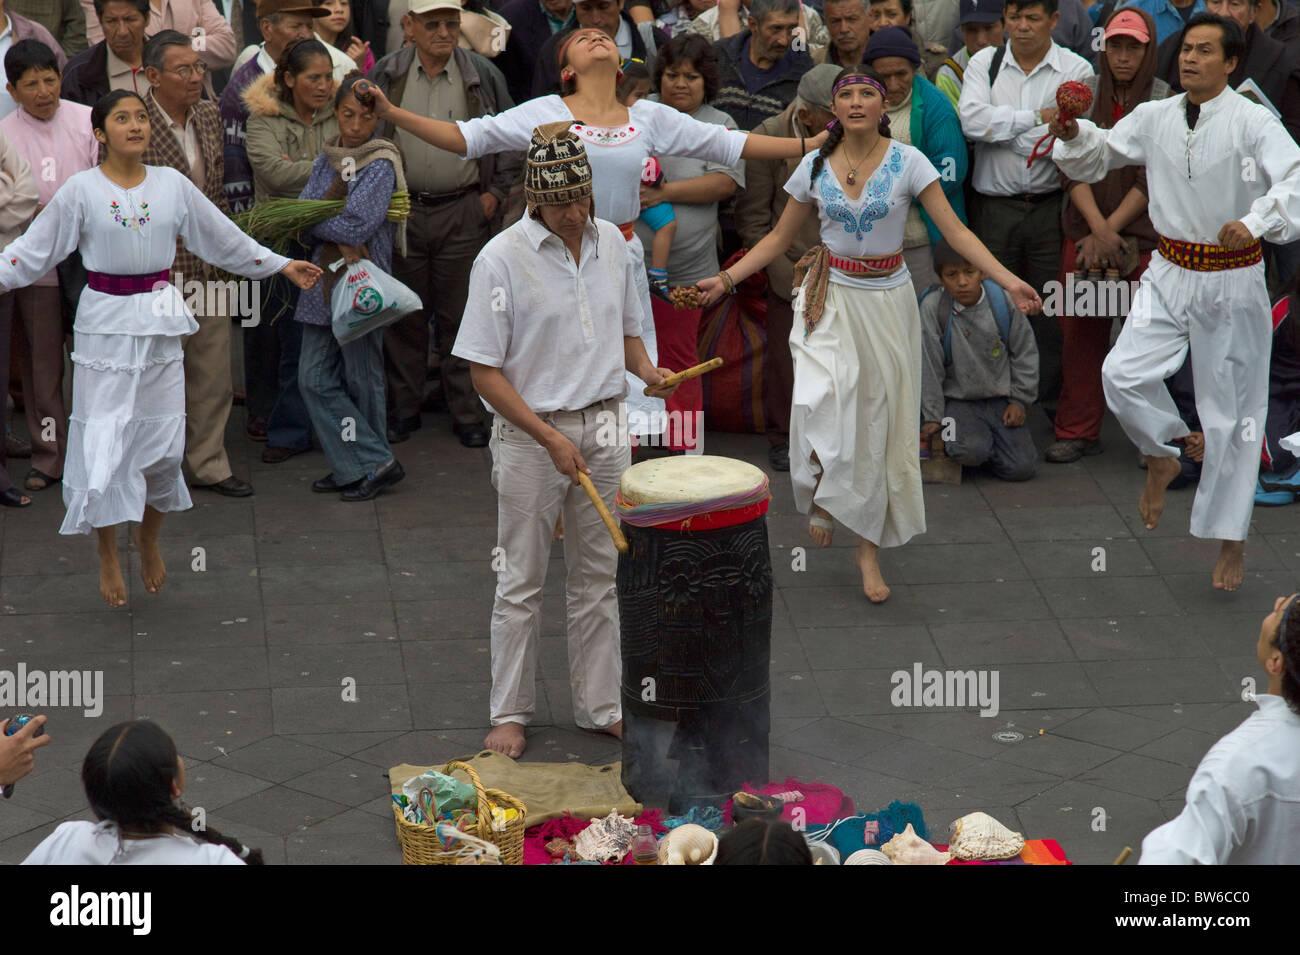 Indigenous people dancing in Plaza Grande, Quito, Ecuador - Stock Image